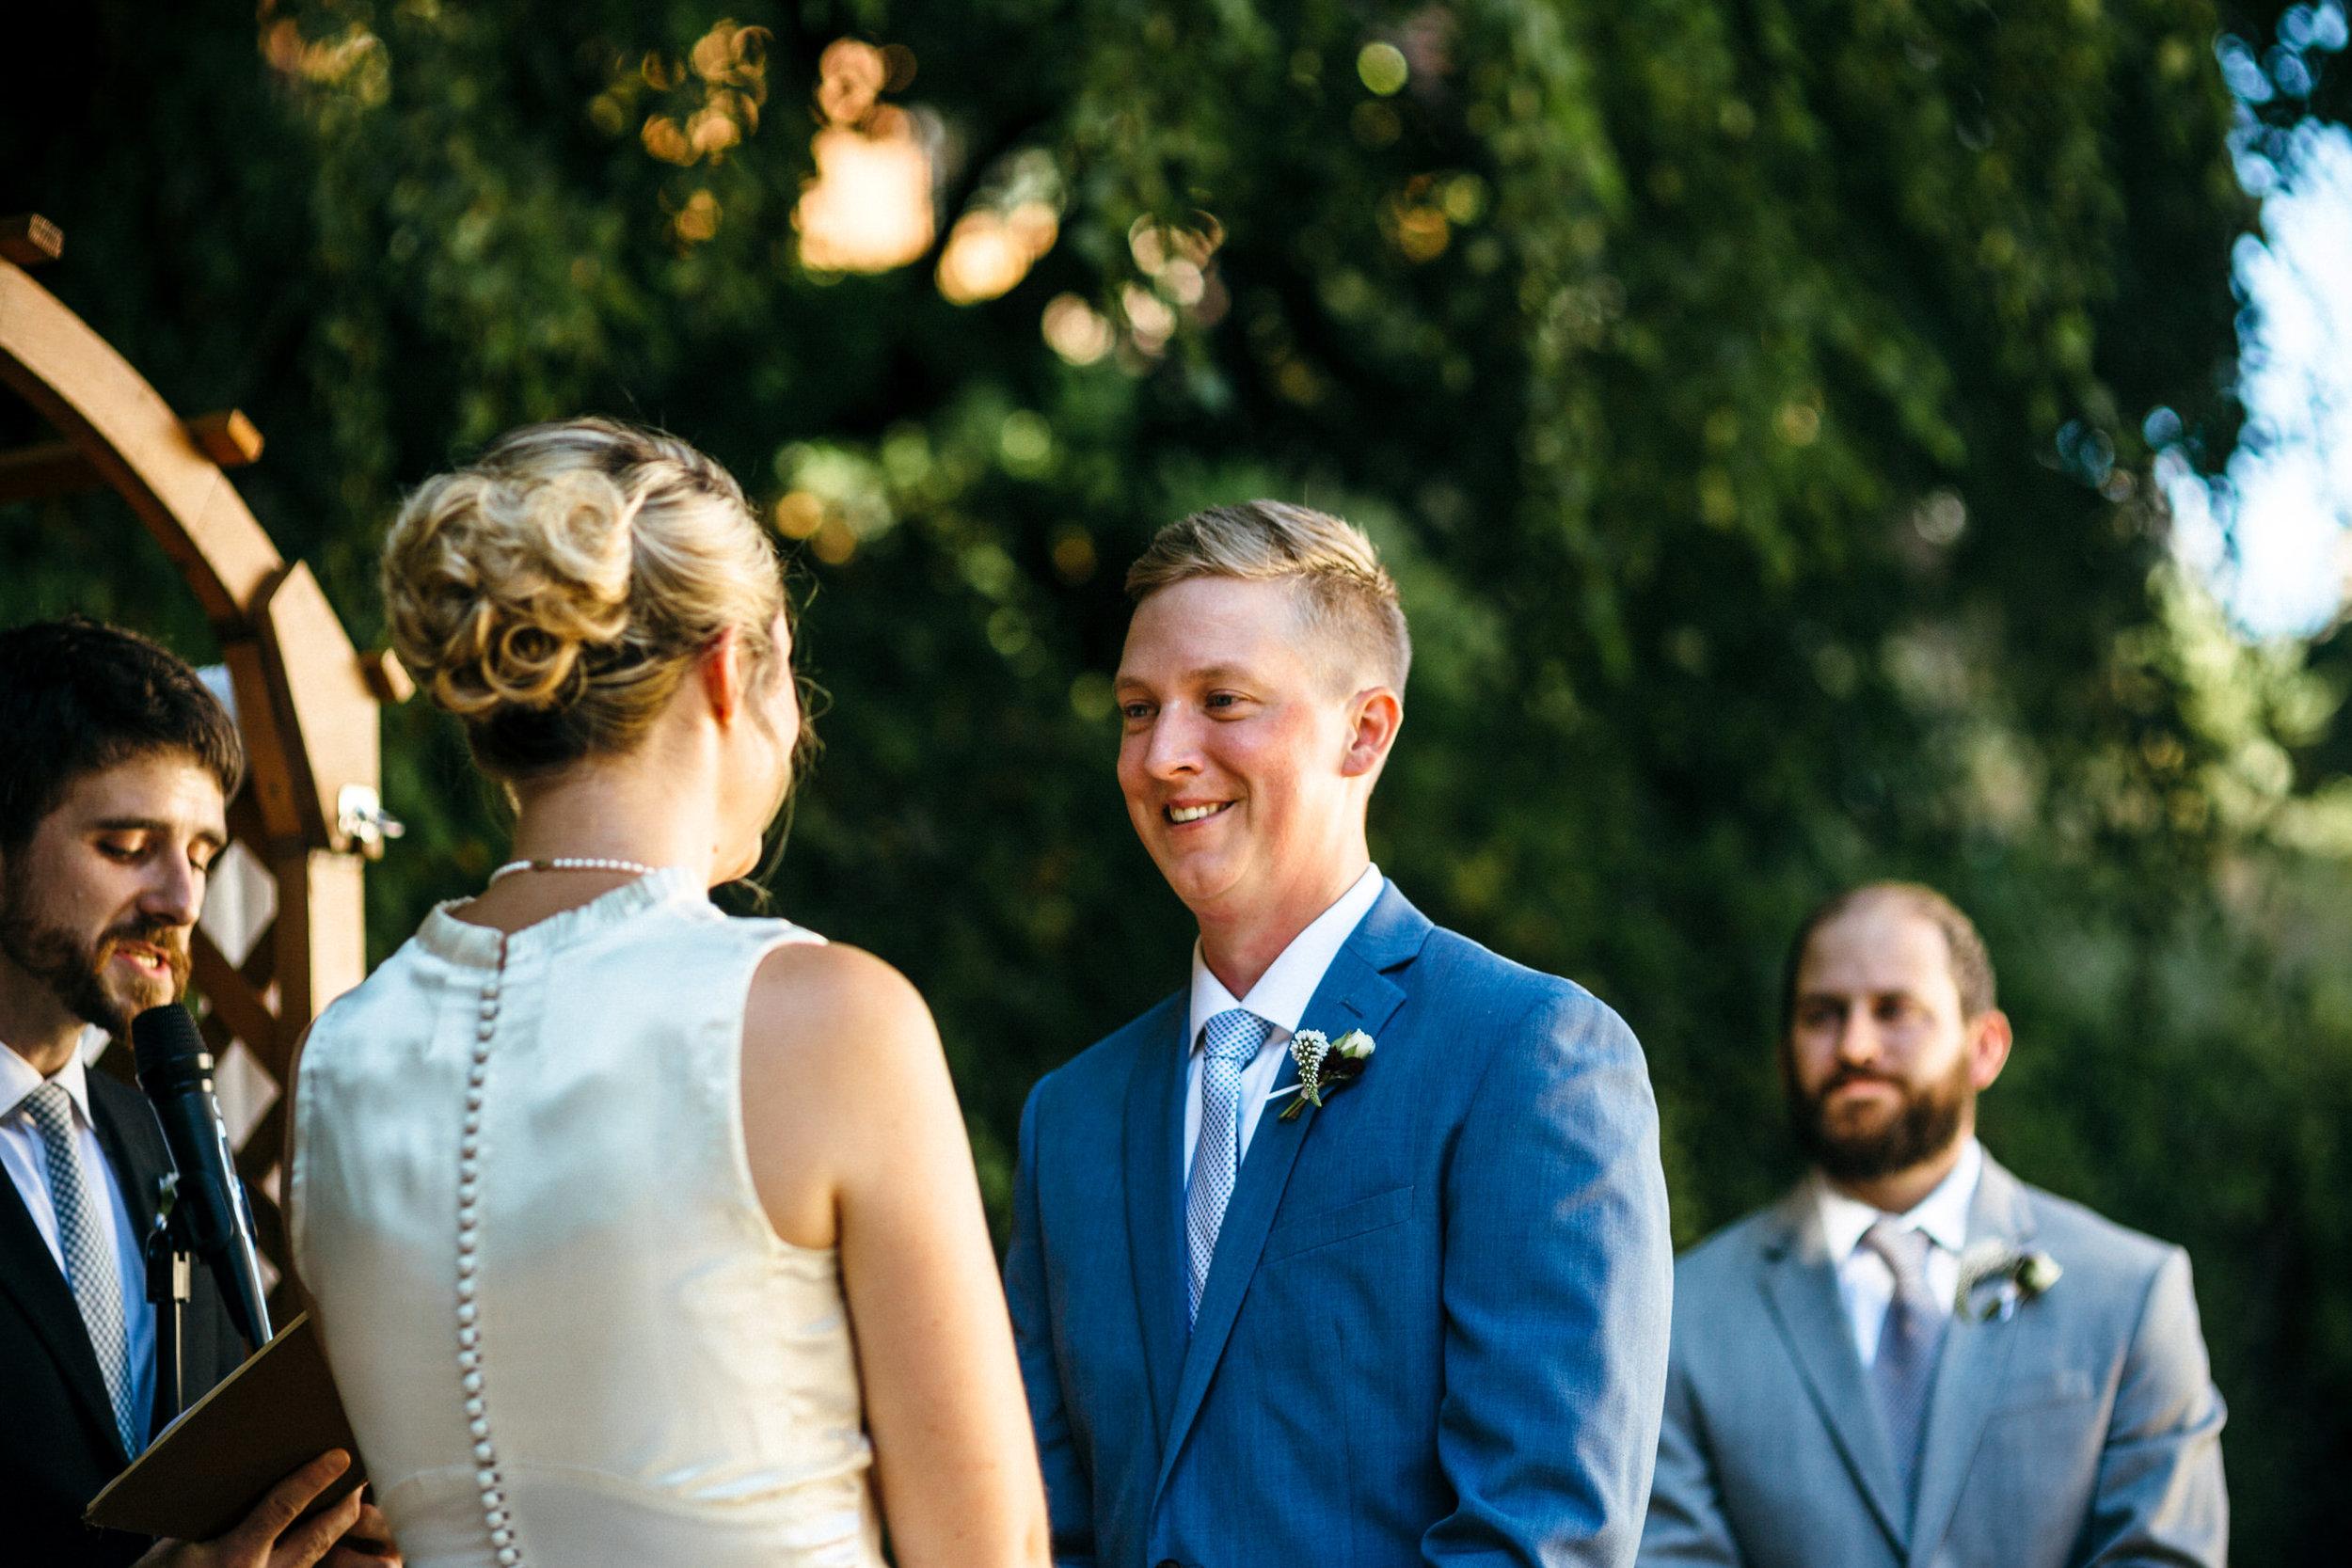 Laurelhurst Park club wedding photographer Portand pdx Oregon062.JPG